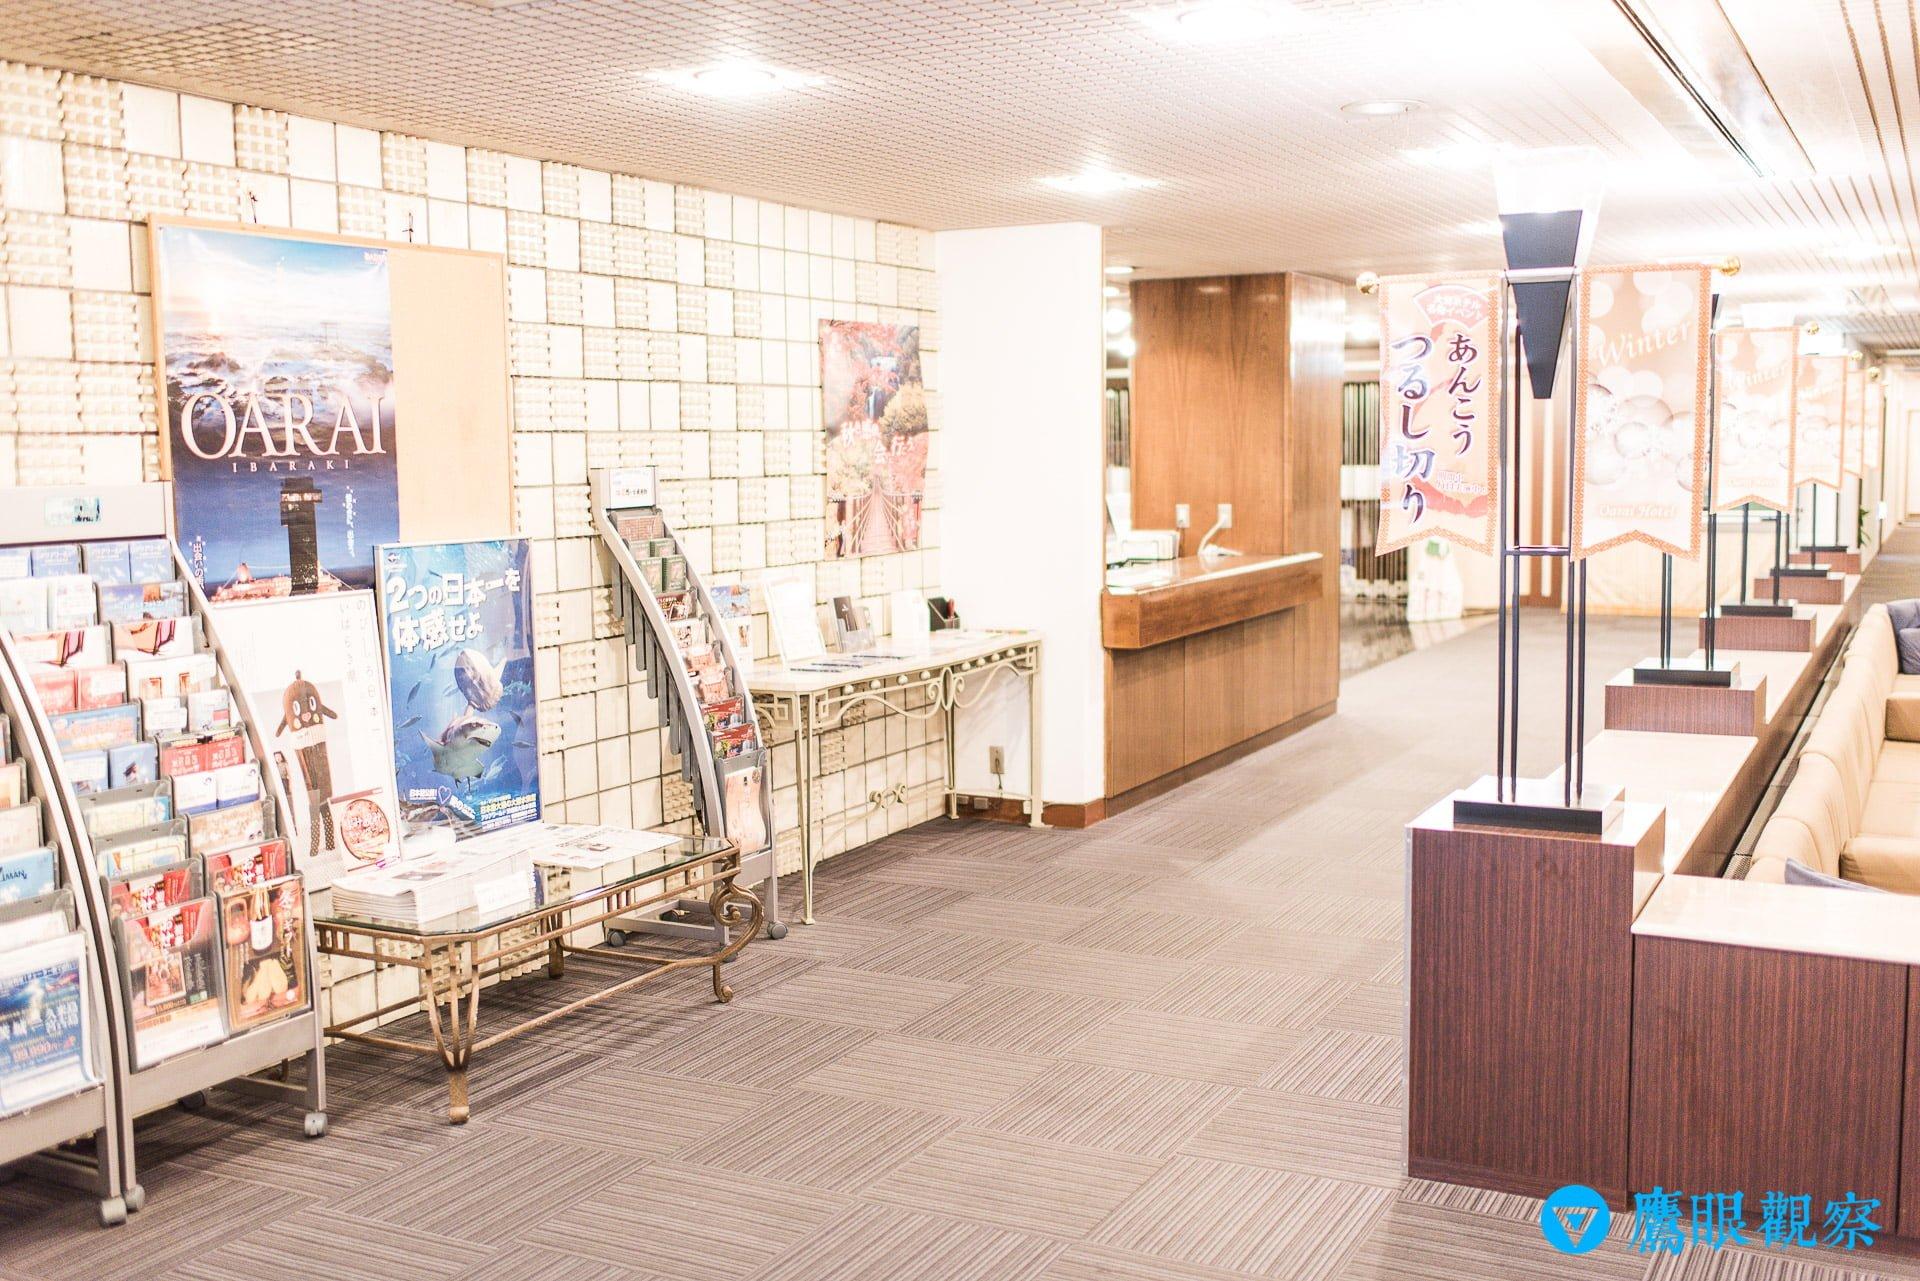 Travel Oarai Hotel in Ibaraki Prefecture Japan 61 日本茨城縣/東茨城/大洗飯店(大洗ホテル)/旅館推薦與住宿旅遊心得分享